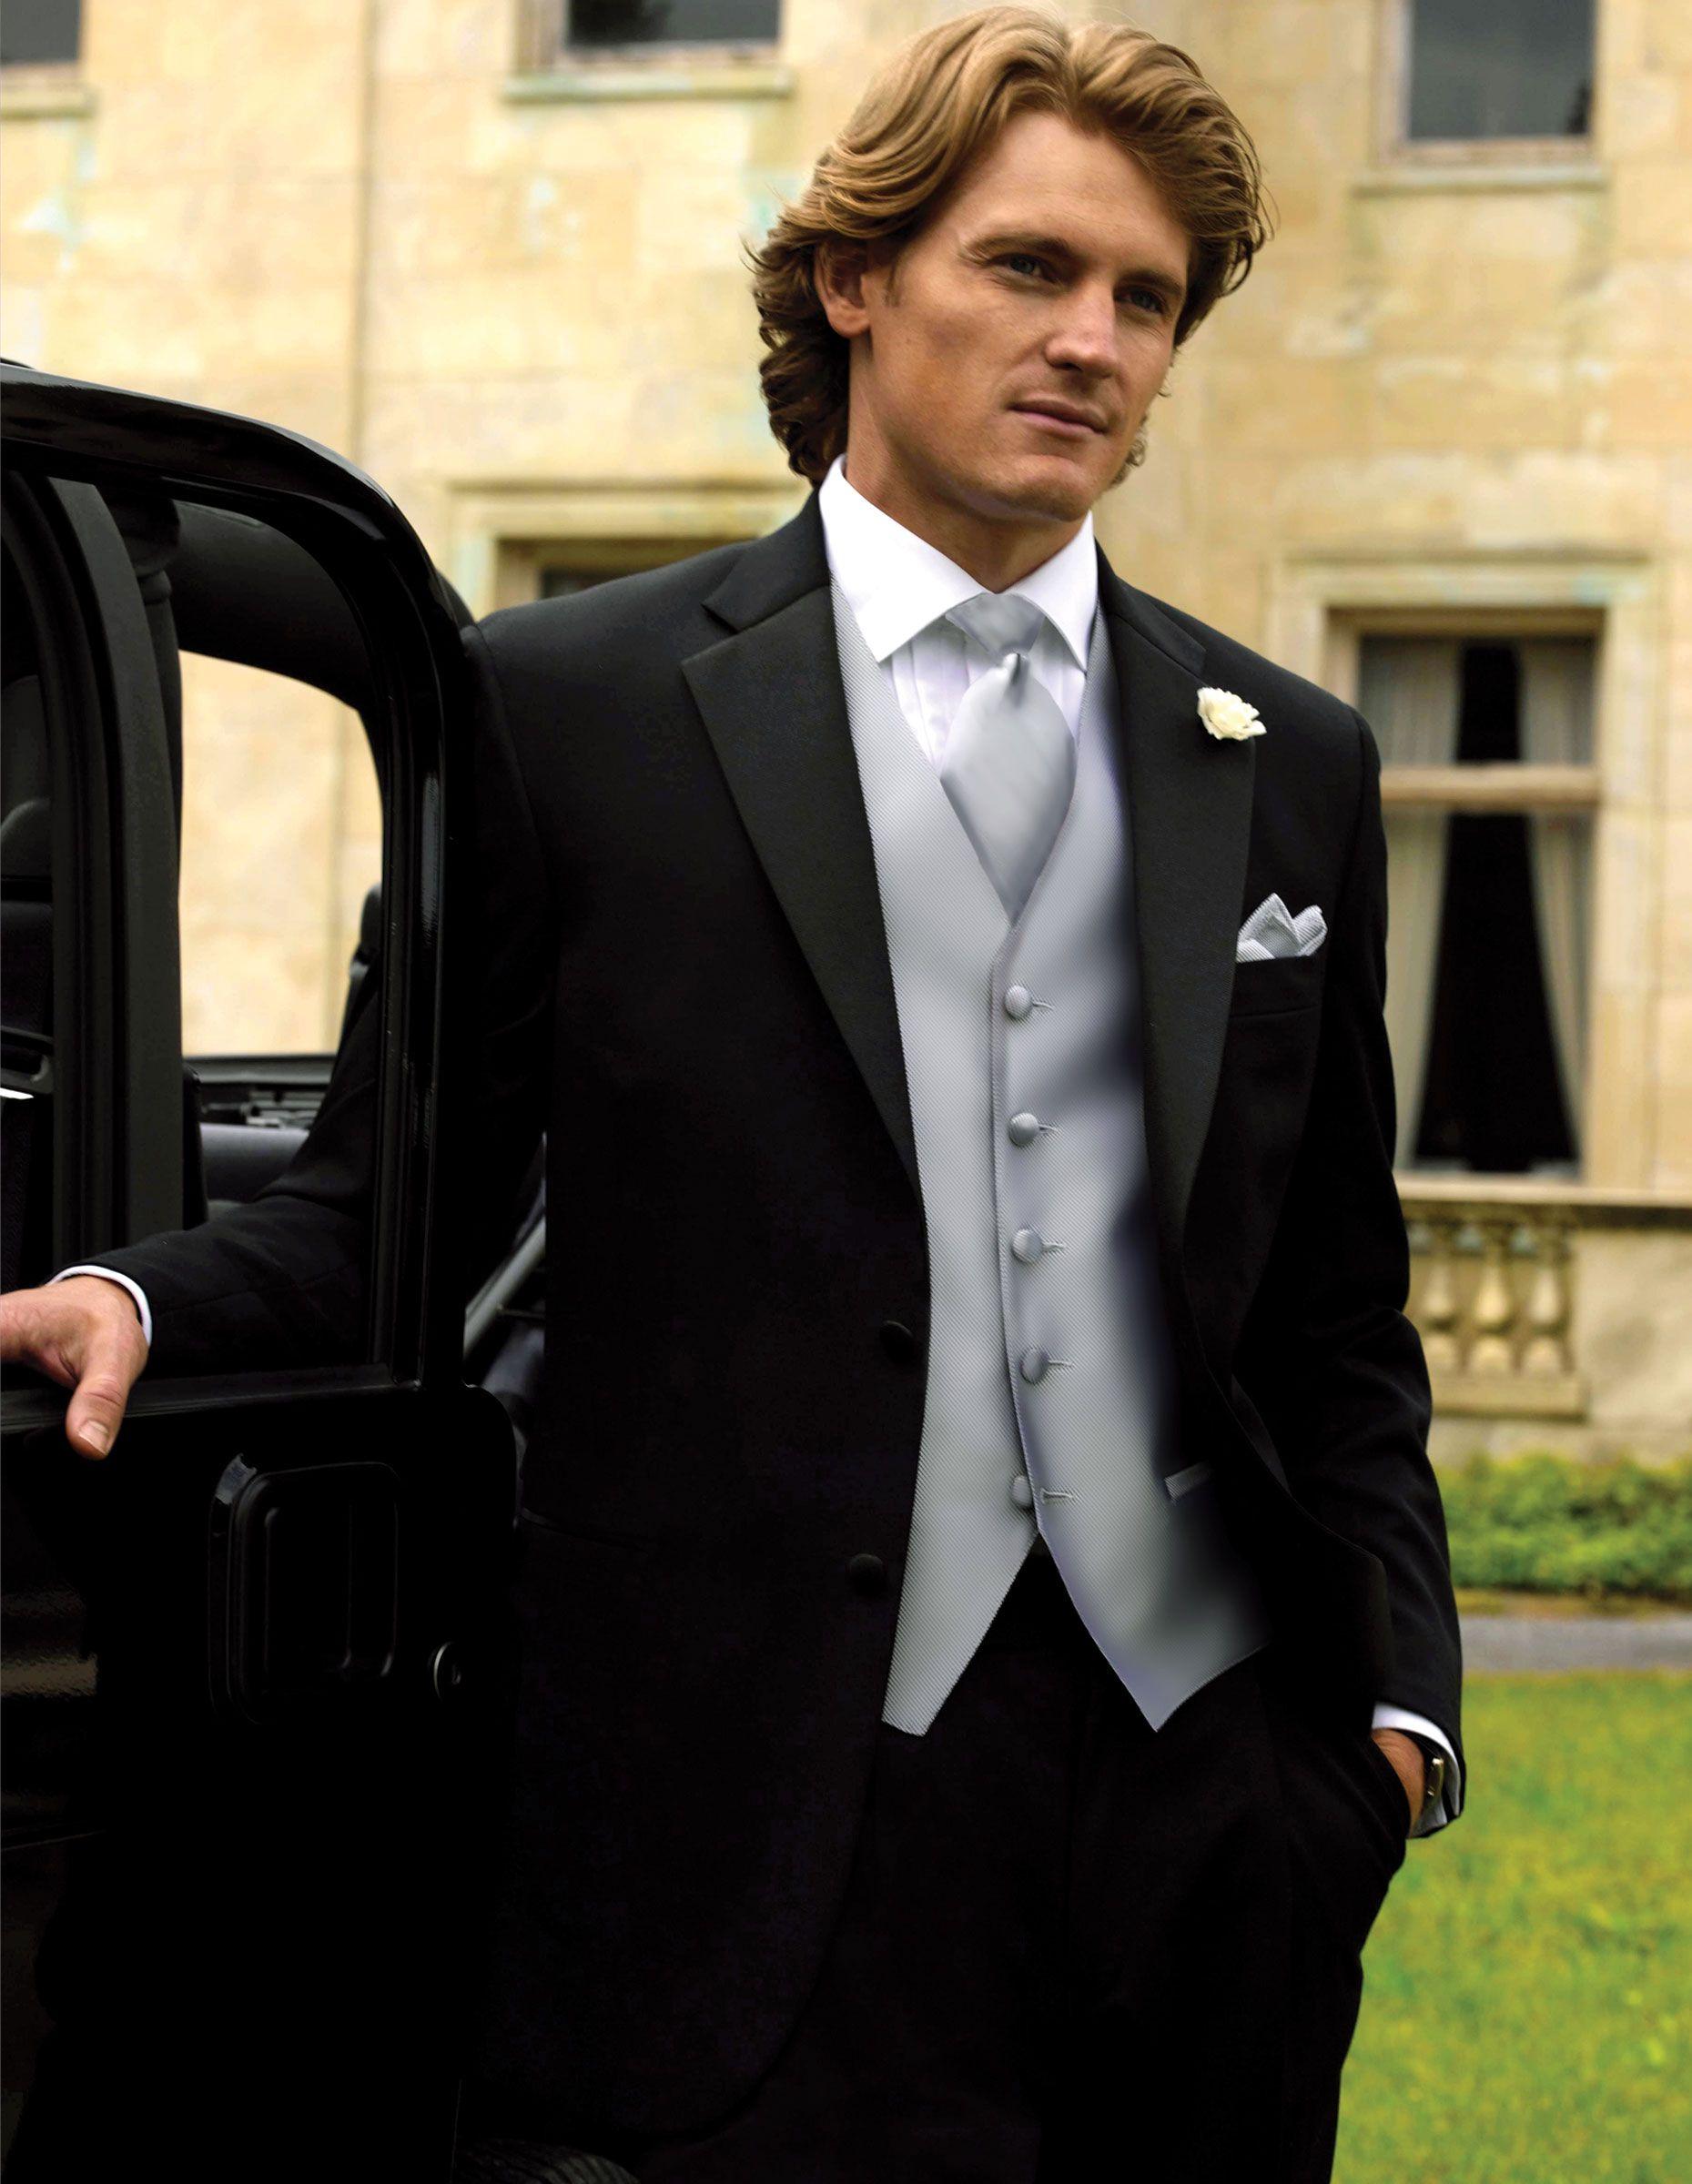 tuxedo cravat Google Search Black tuxedo wedding, The